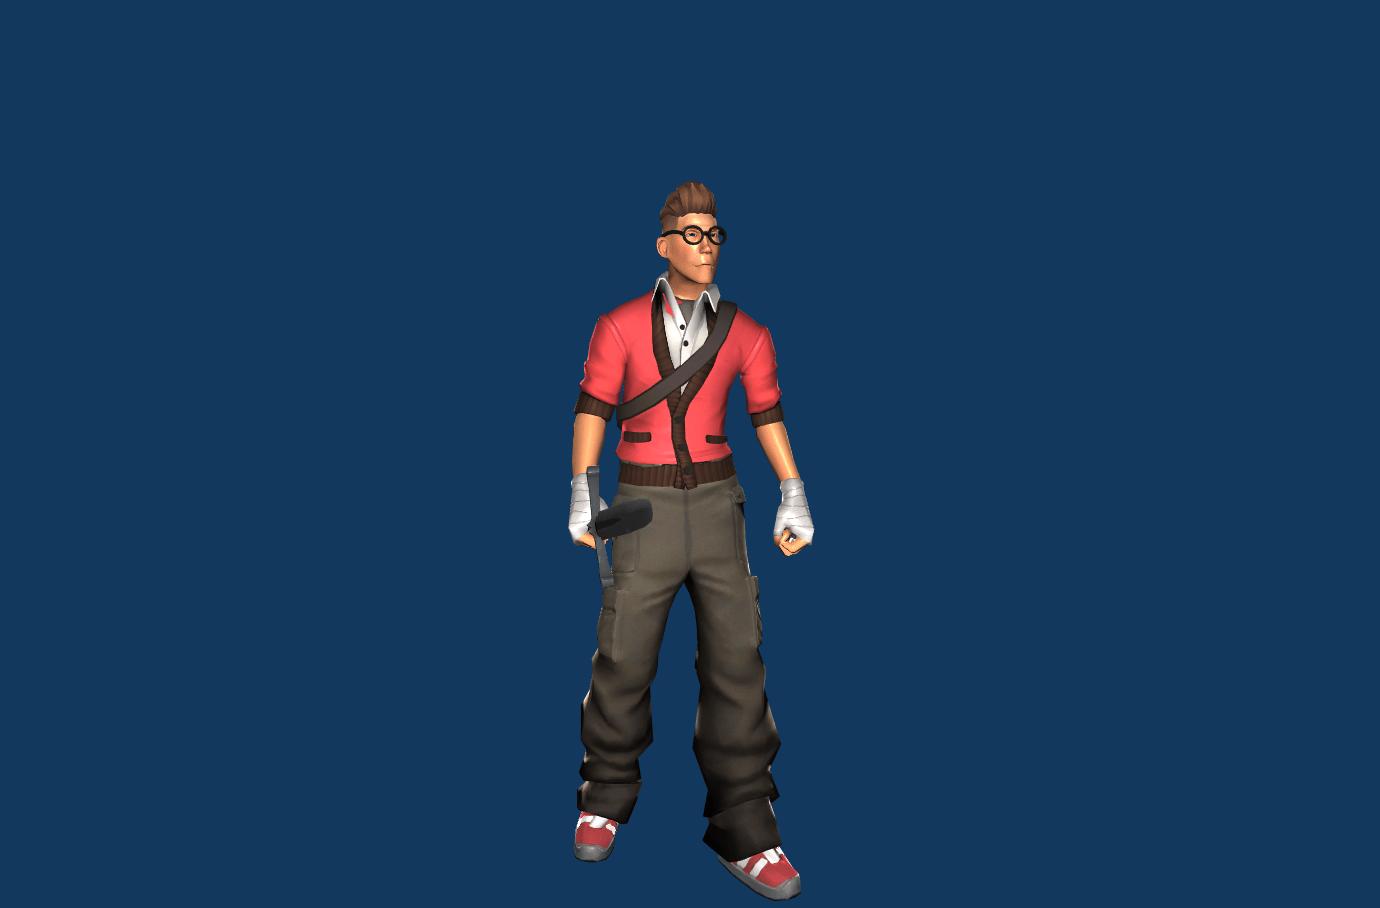 d d nerd scout